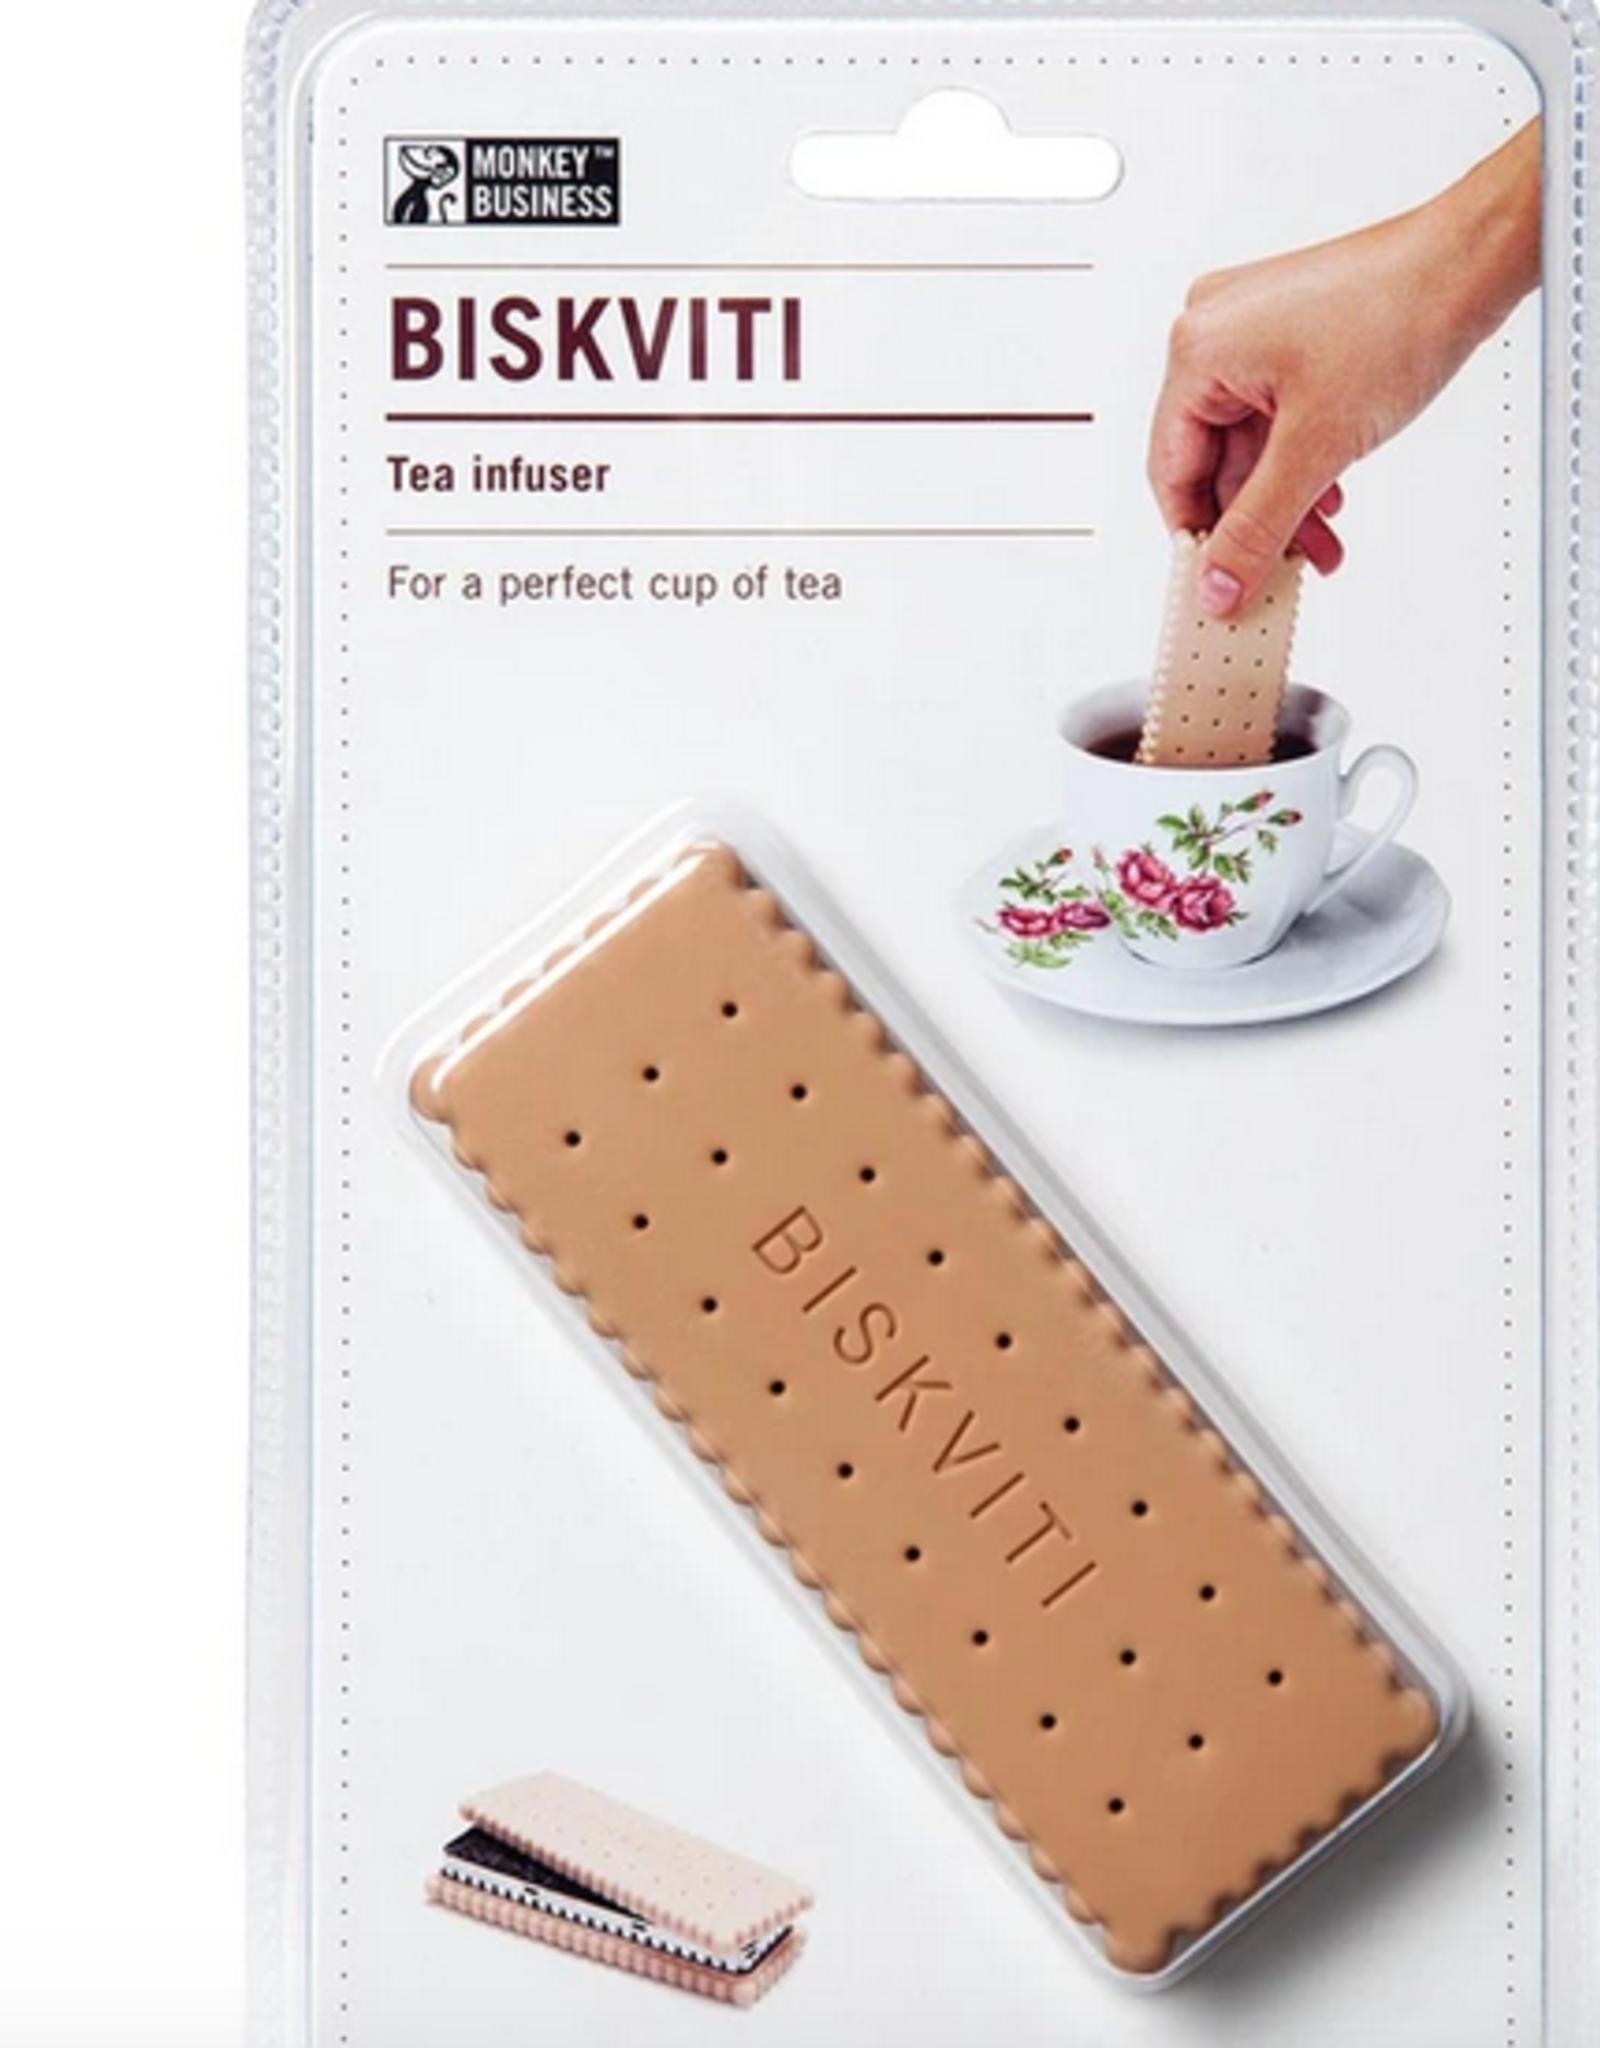 abodee Biskviti tea infuser